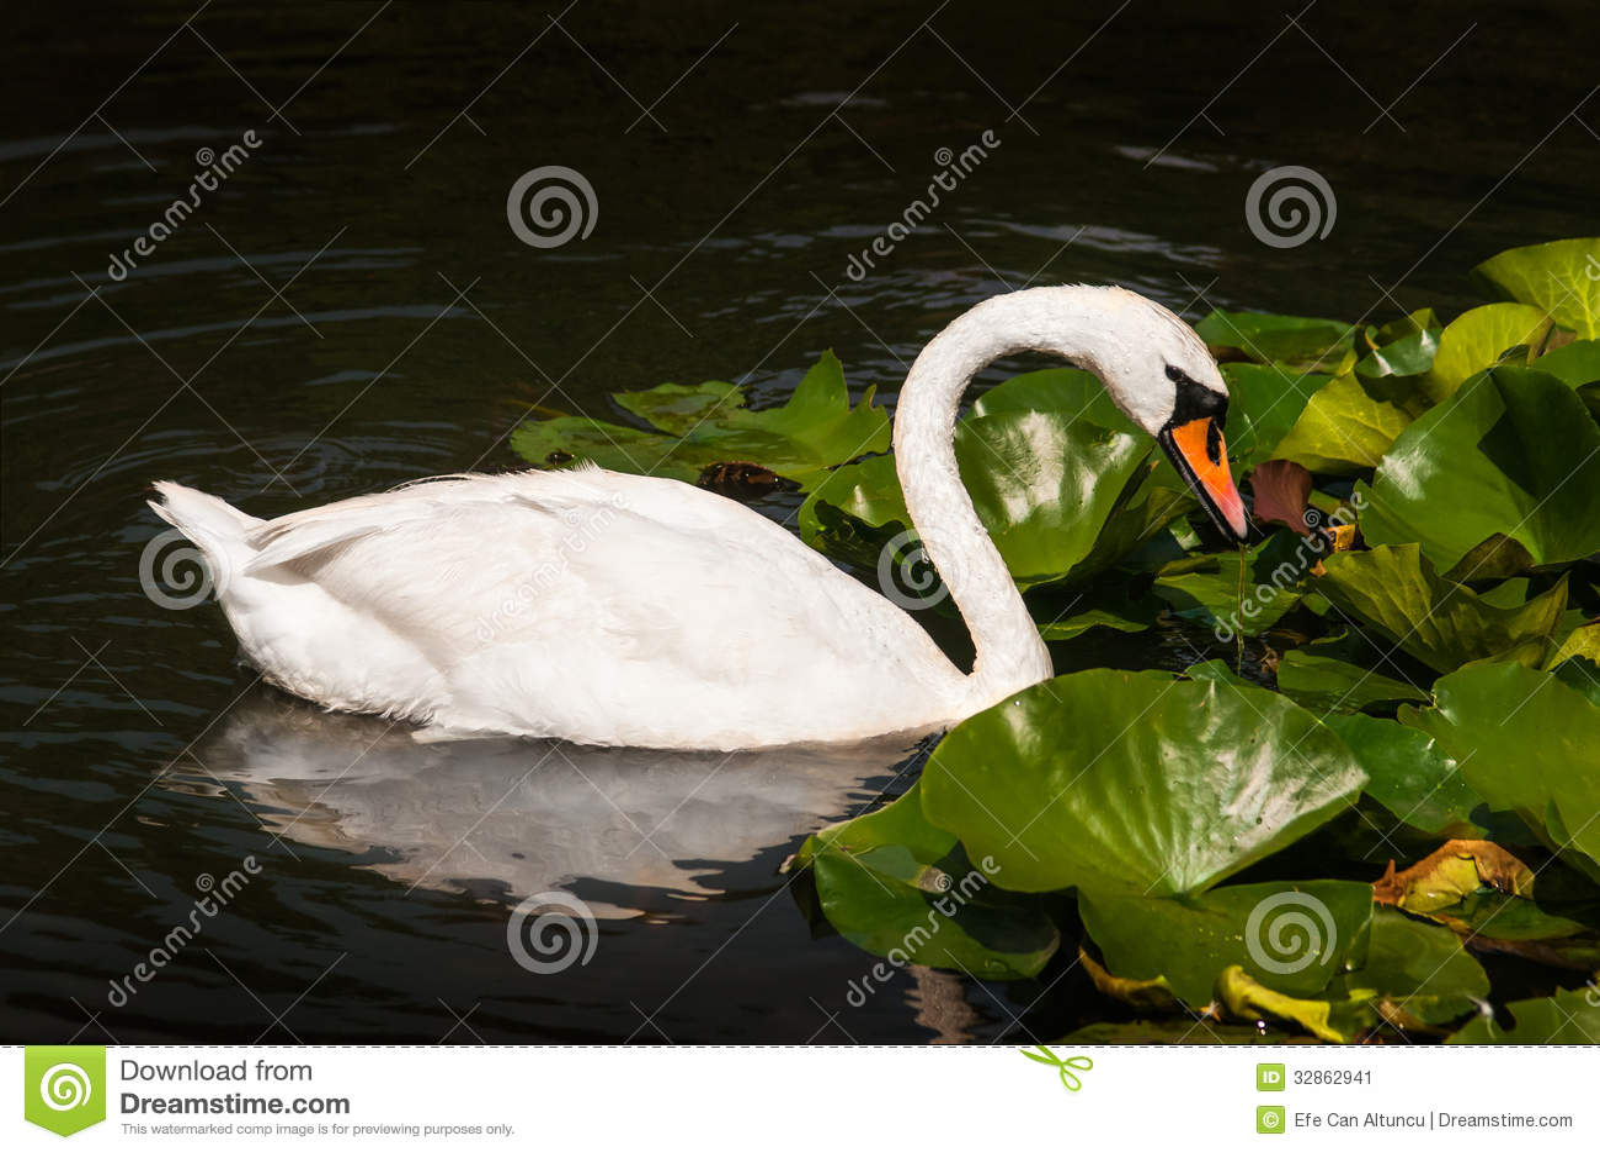 swan stock image image 32862941